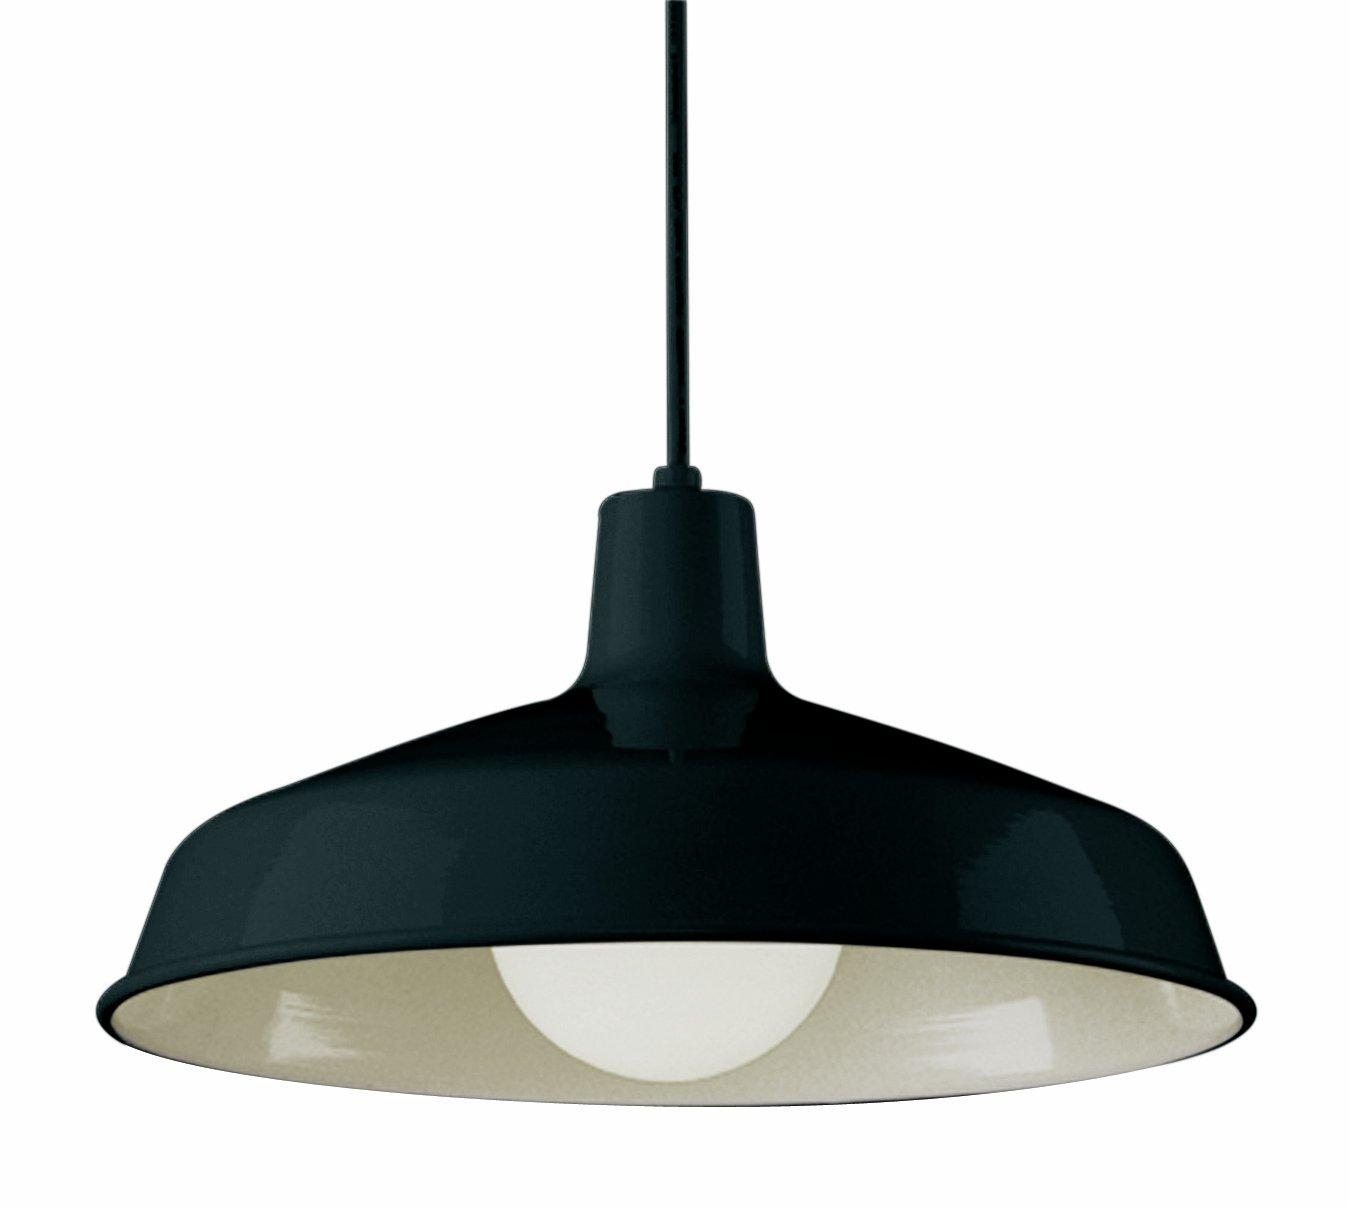 Trans Globe Lighting 1100 BK Indoor Sherman 15.5  Pendant Black - Ceiling Pendant Fixtures - Amazon.com  sc 1 st  Amazon.com & Trans Globe Lighting 1100 BK Indoor Sherman 15.5